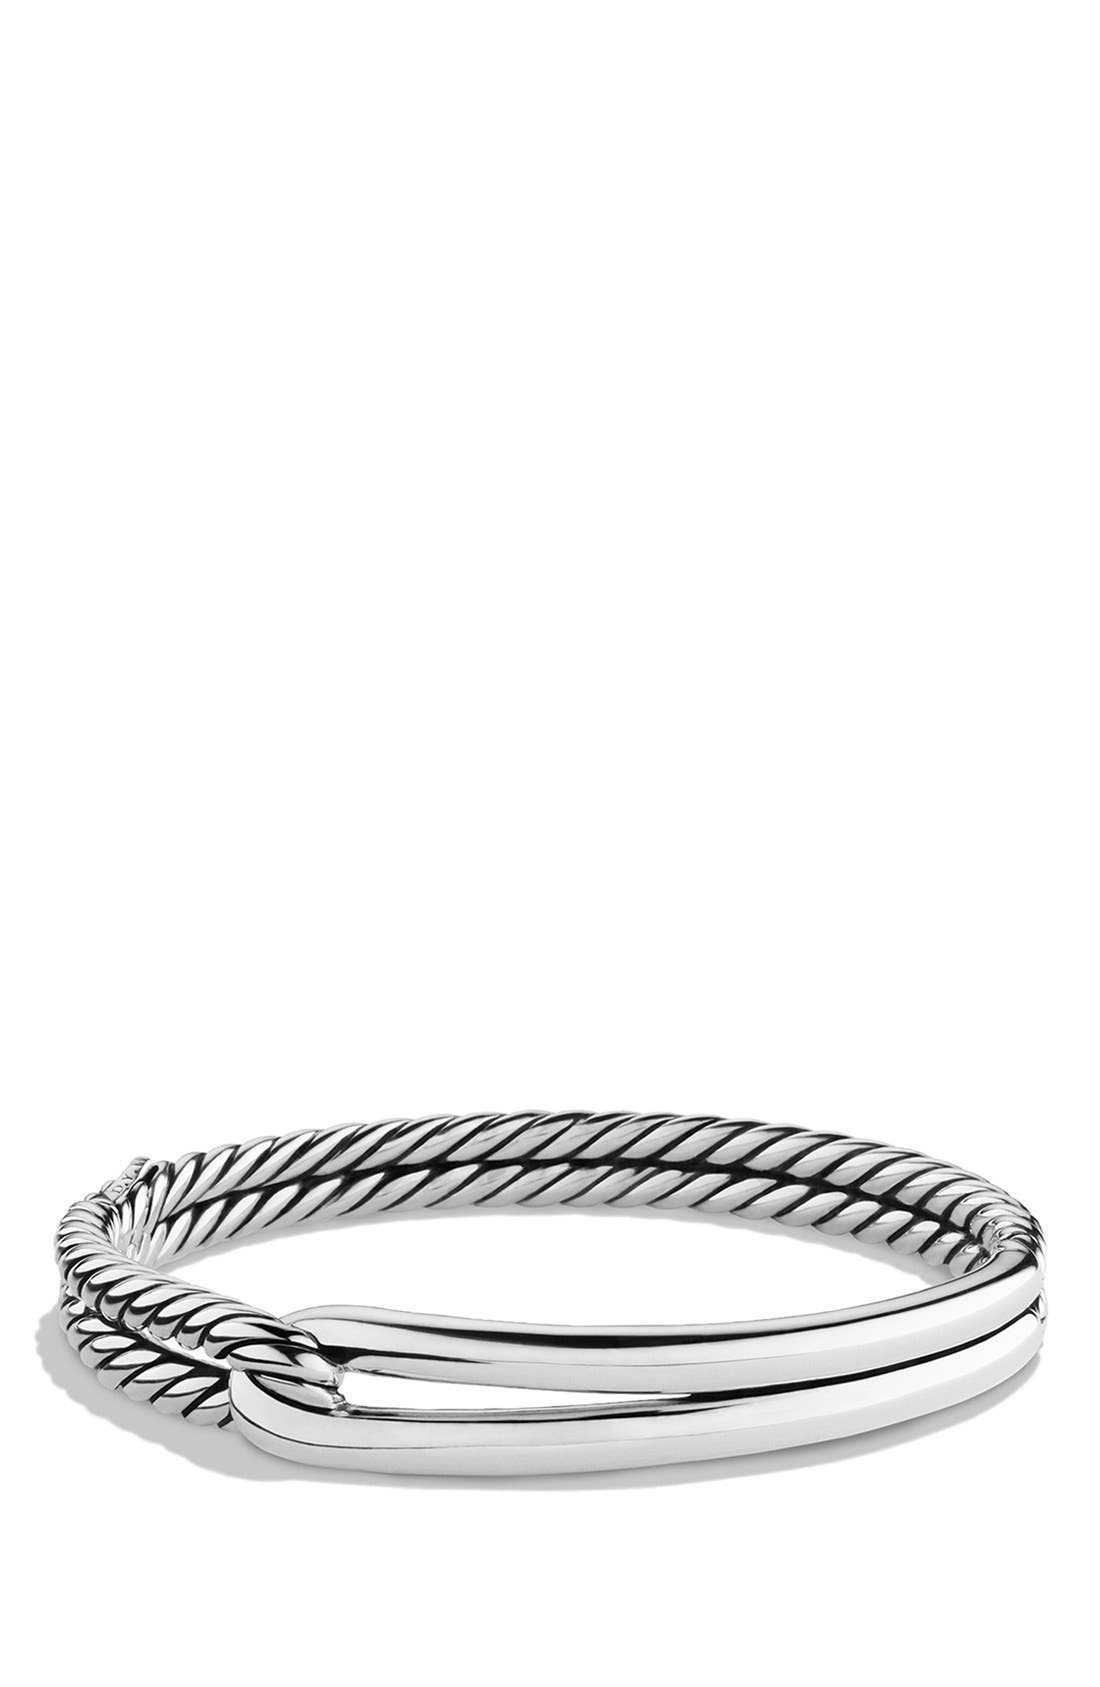 DAVID YURMAN Labyrinth Single Loop Bracelet